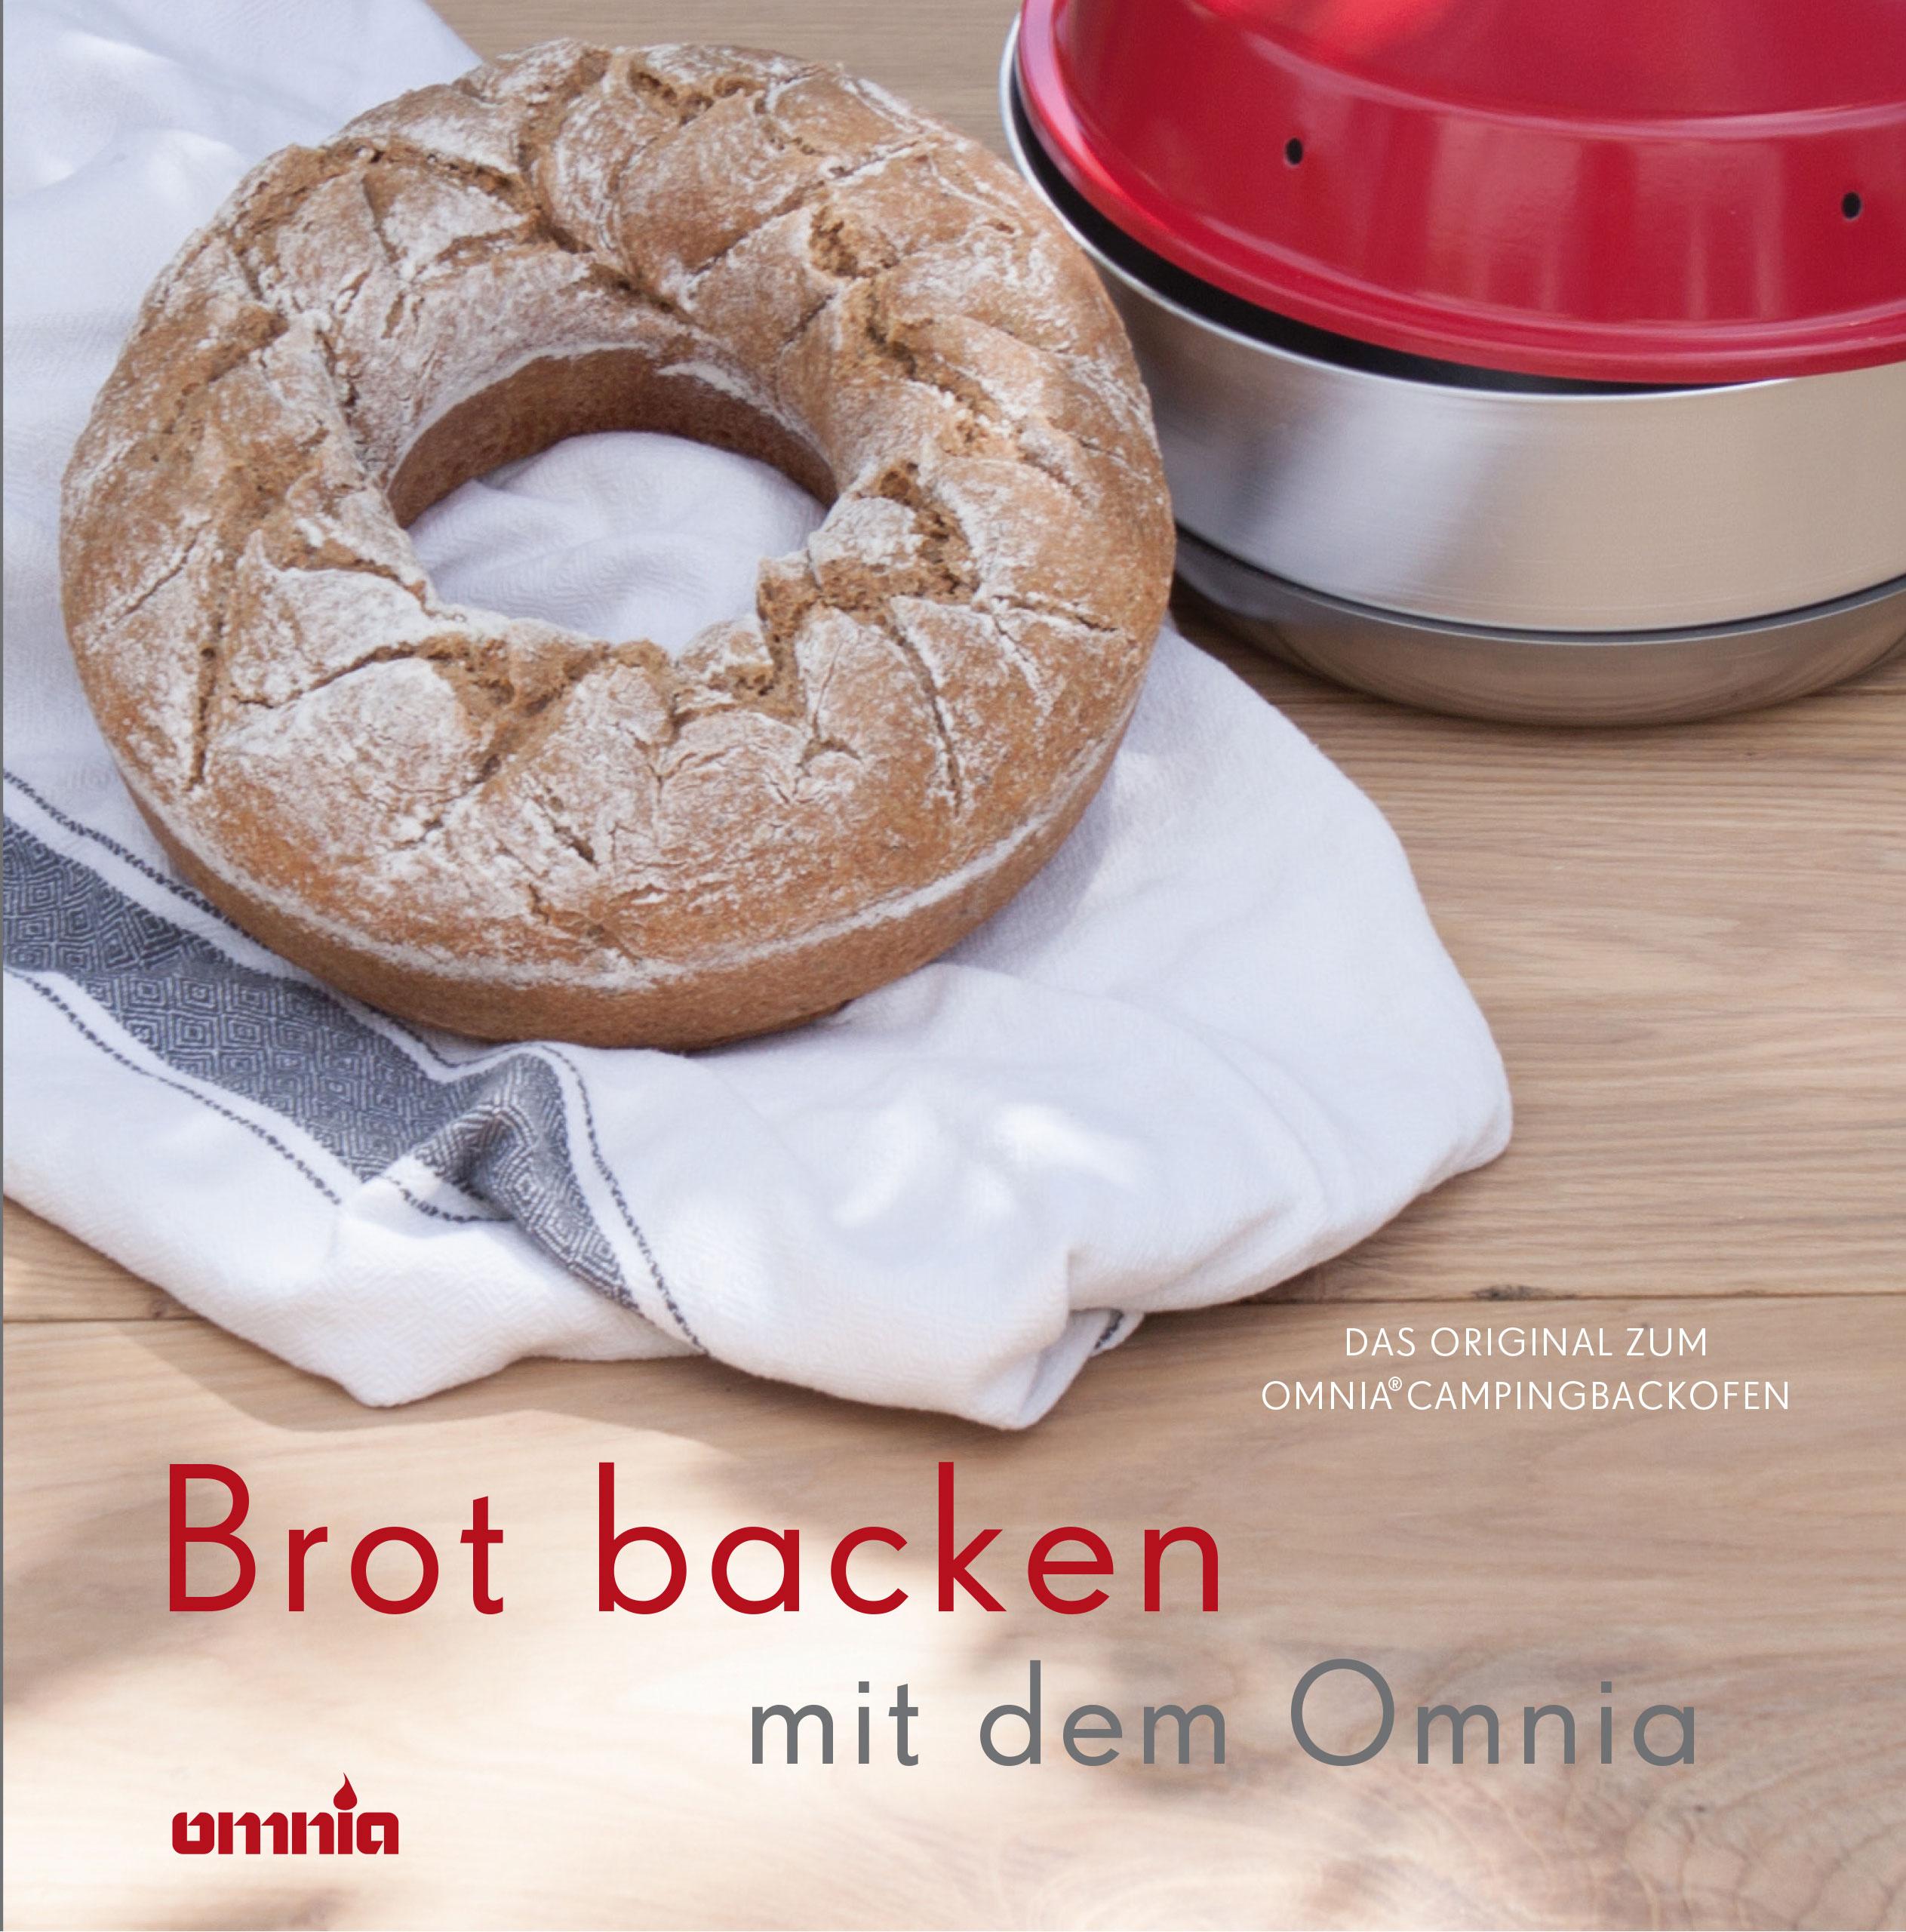 Omnia Kochbuch – Brot backen mit dem Omnia | 07350029450151